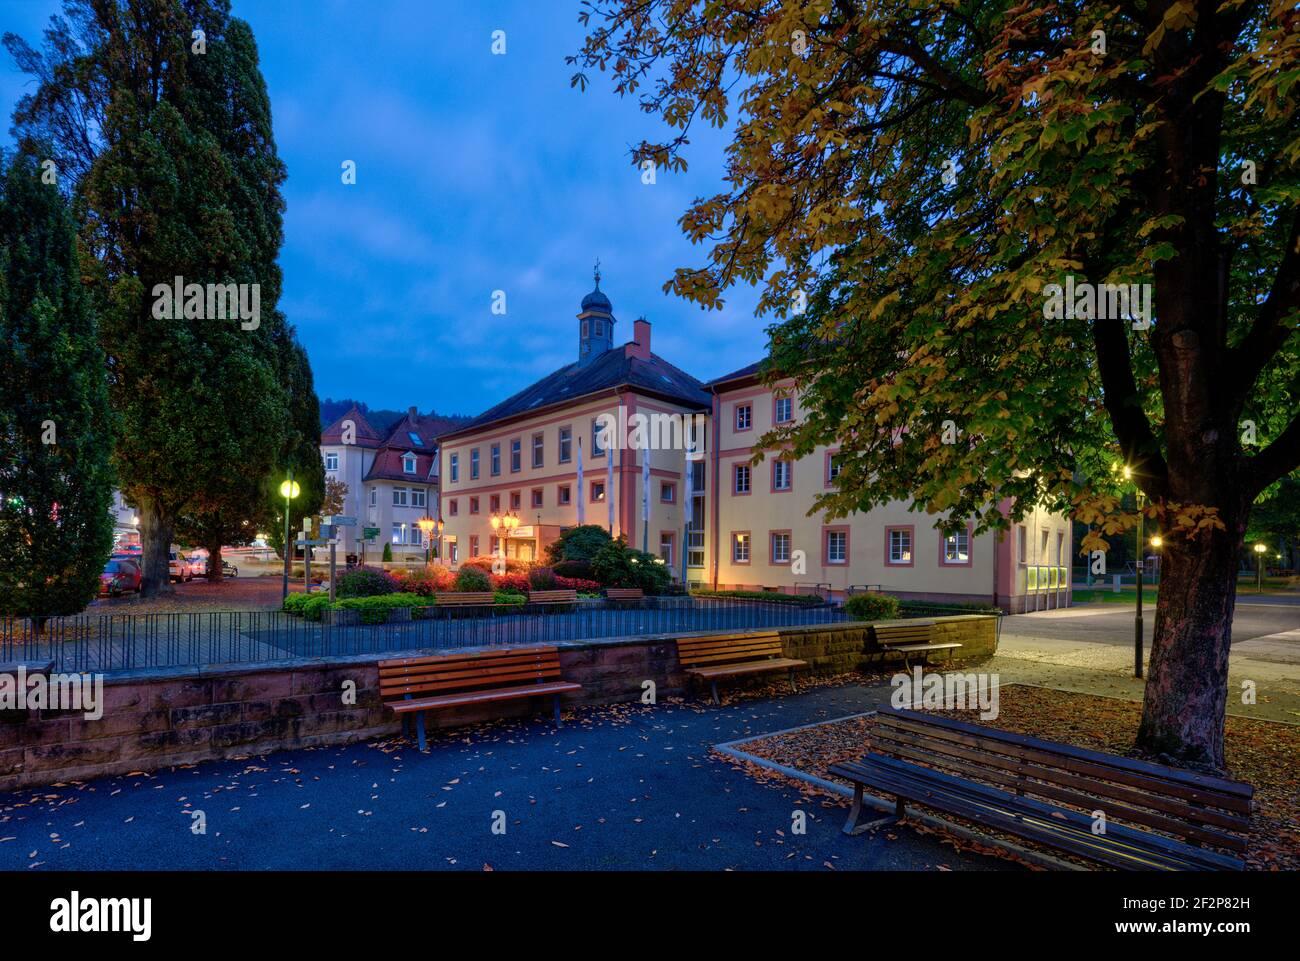 Salinenplatz, spa administration, tourist office, park, green area, Bad Orb, Main-Kinzig-Kreis, Hessen, Germany, Europe Stock Photo